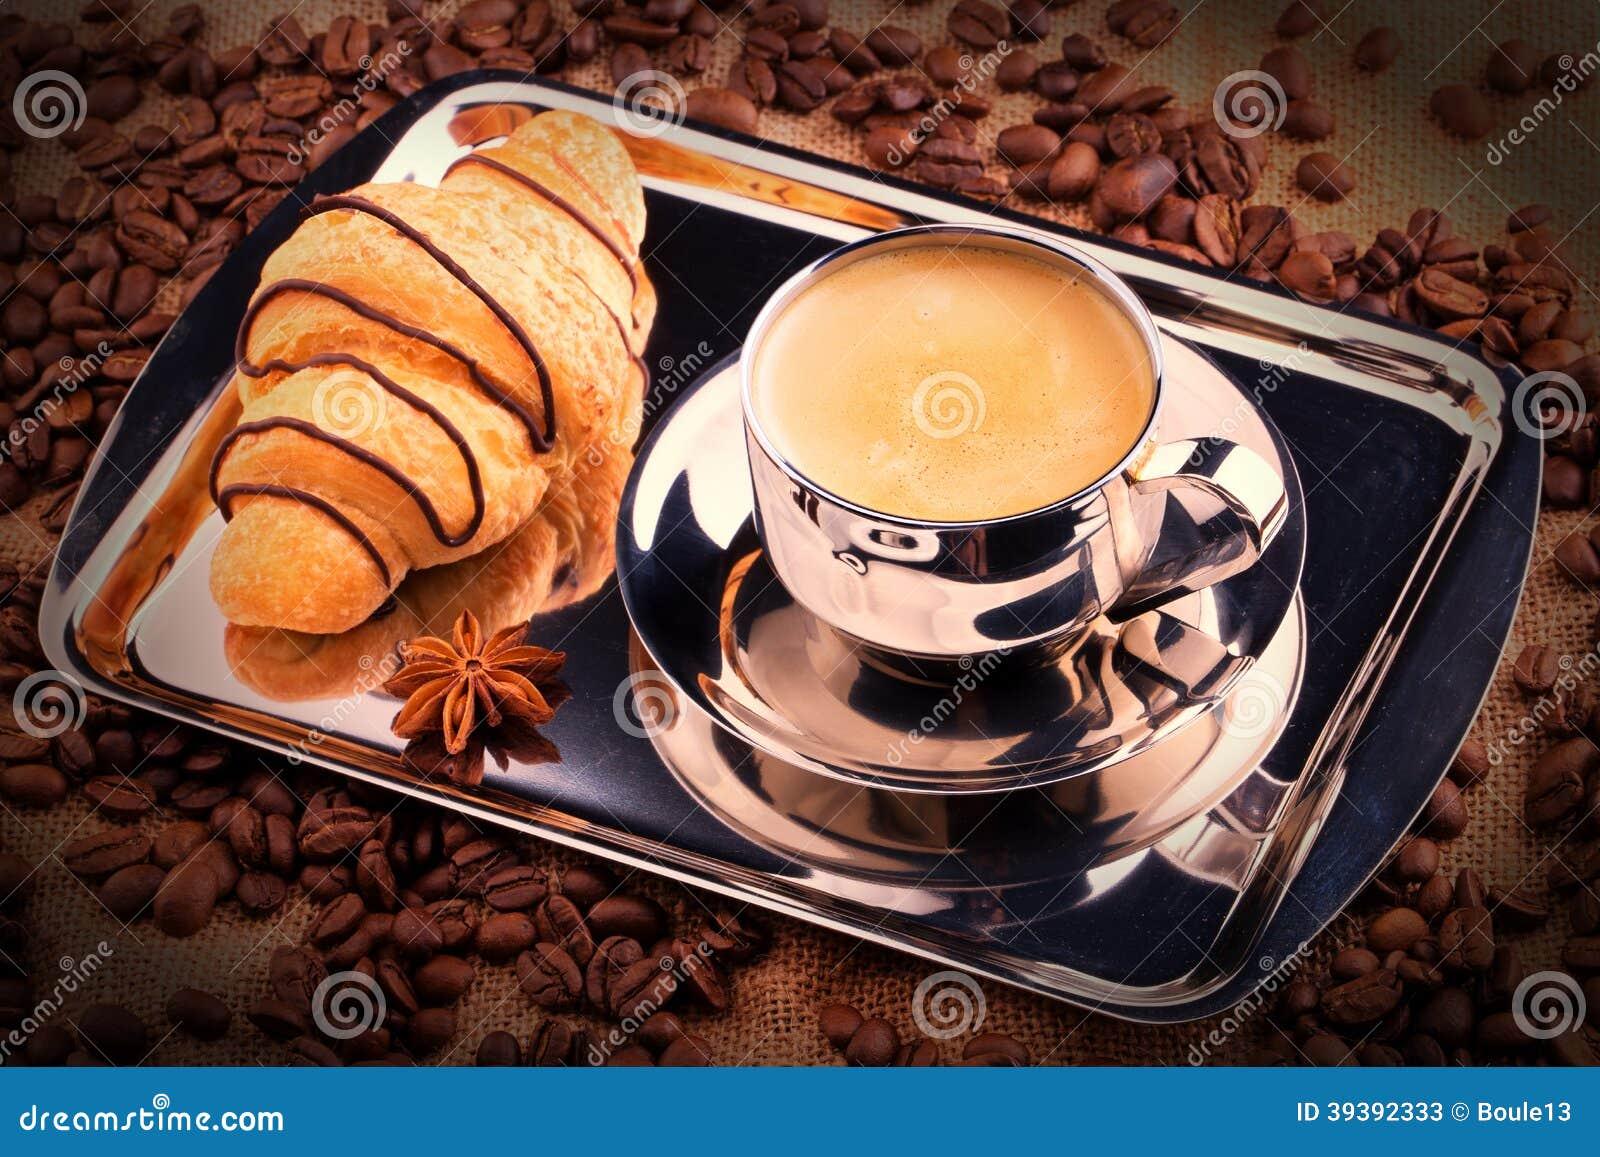 Breakfast Coffee Stock Image Image Of Chocolate Drink